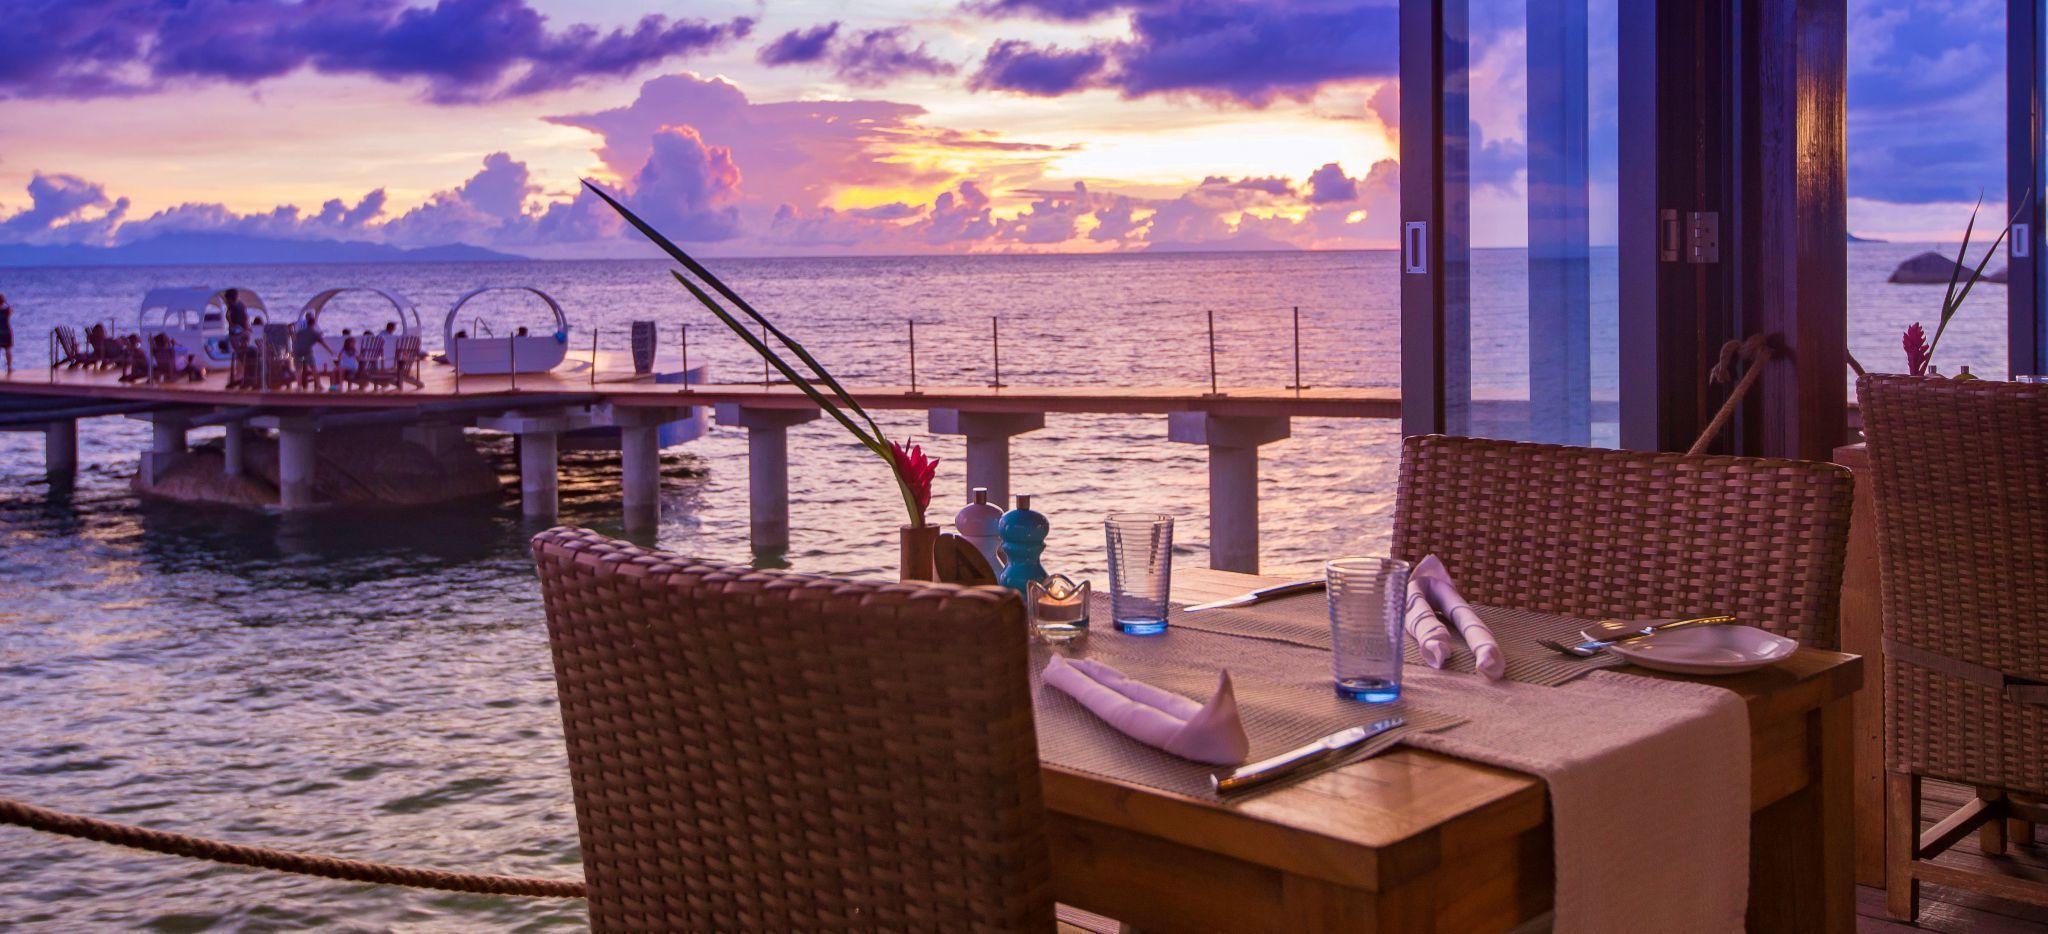 Ausblick vom Restaurant Mango Terrace mit Bar am Pool am Abend